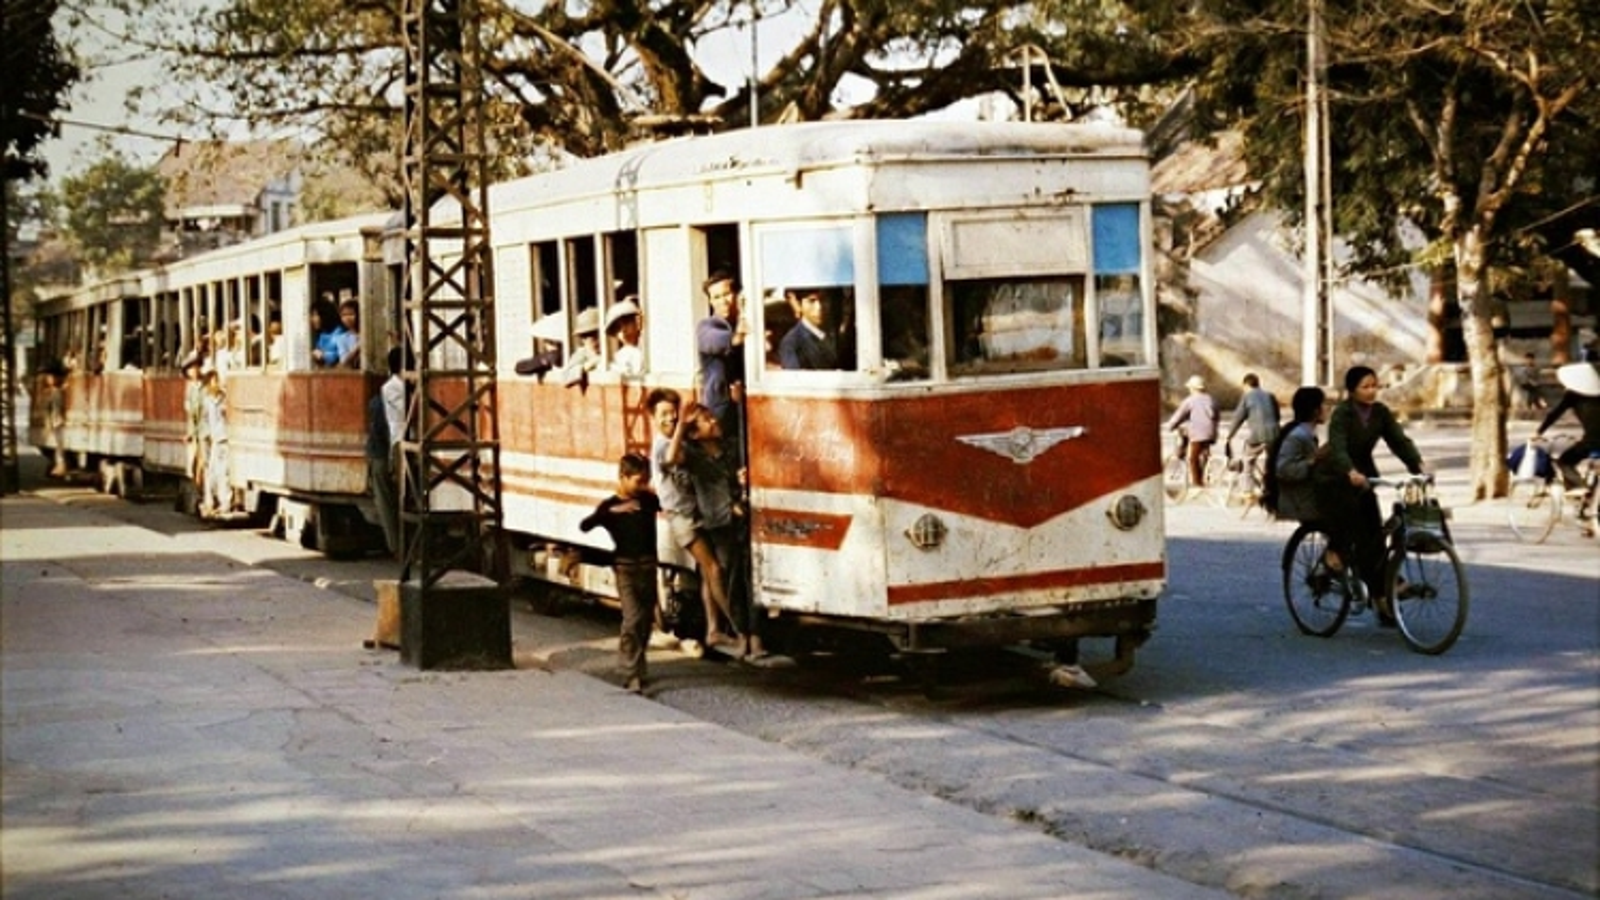 Model tram brings back feelings of a bygone era in Hanoi